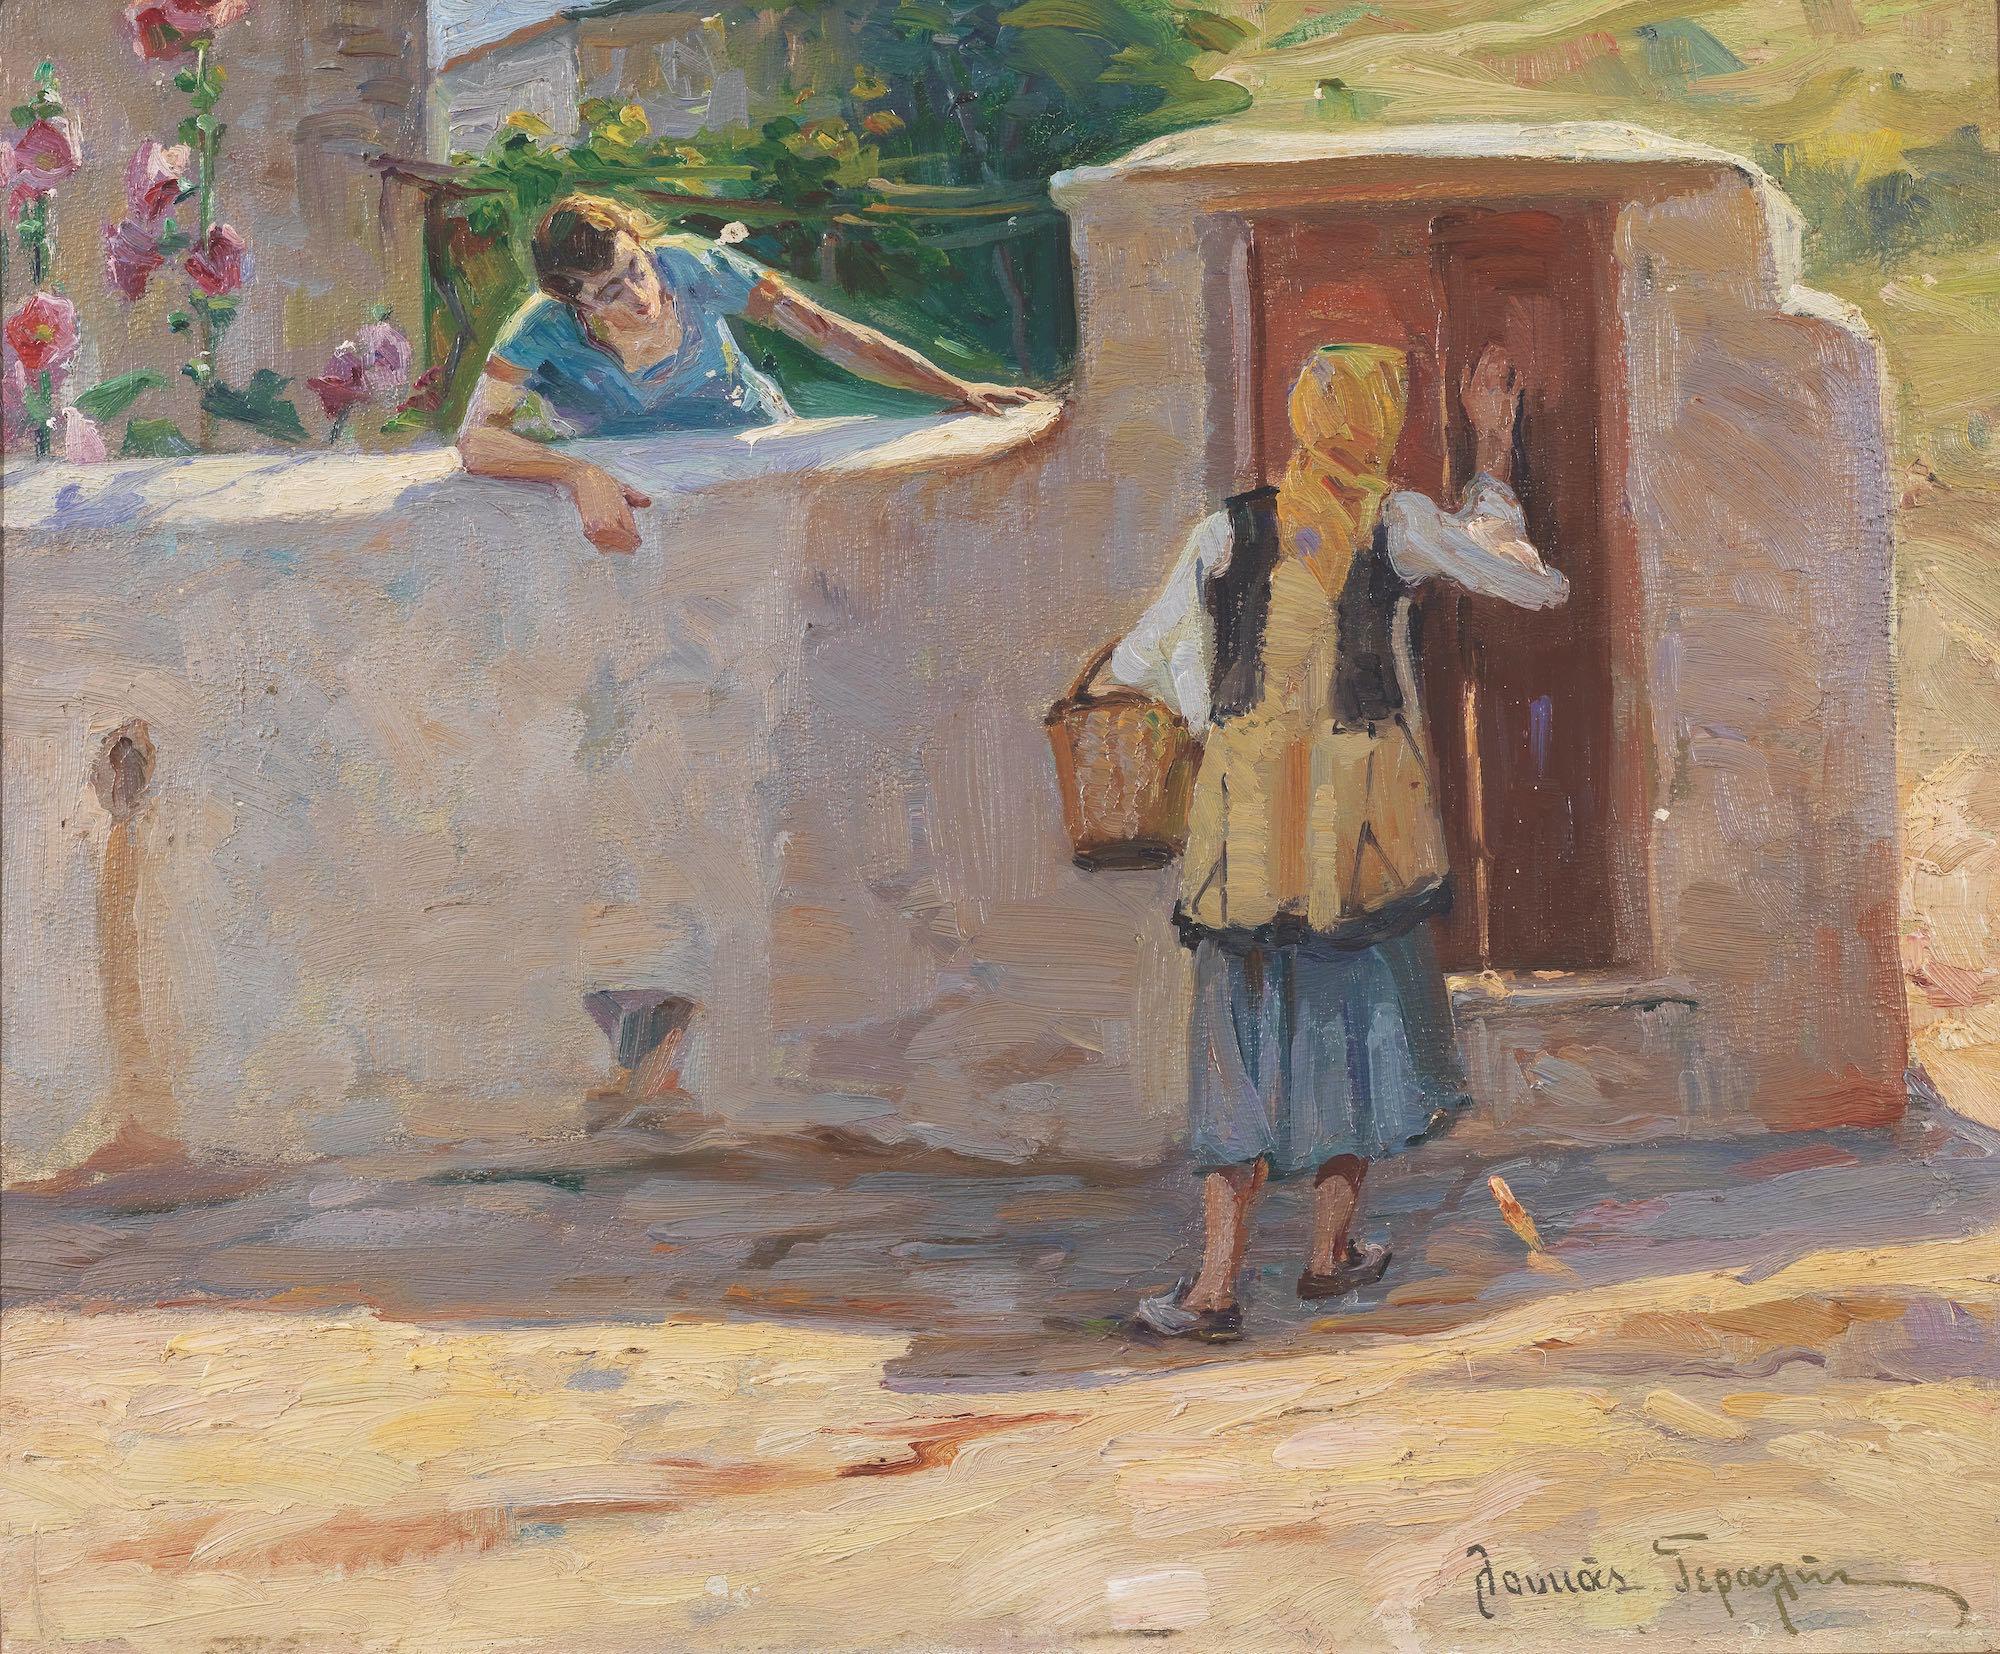 Loucas Geralis (Greek, 1875-1958) (AR), The visitor, oil on hardboard, 37 x 45 cm. - Image 2 of 2